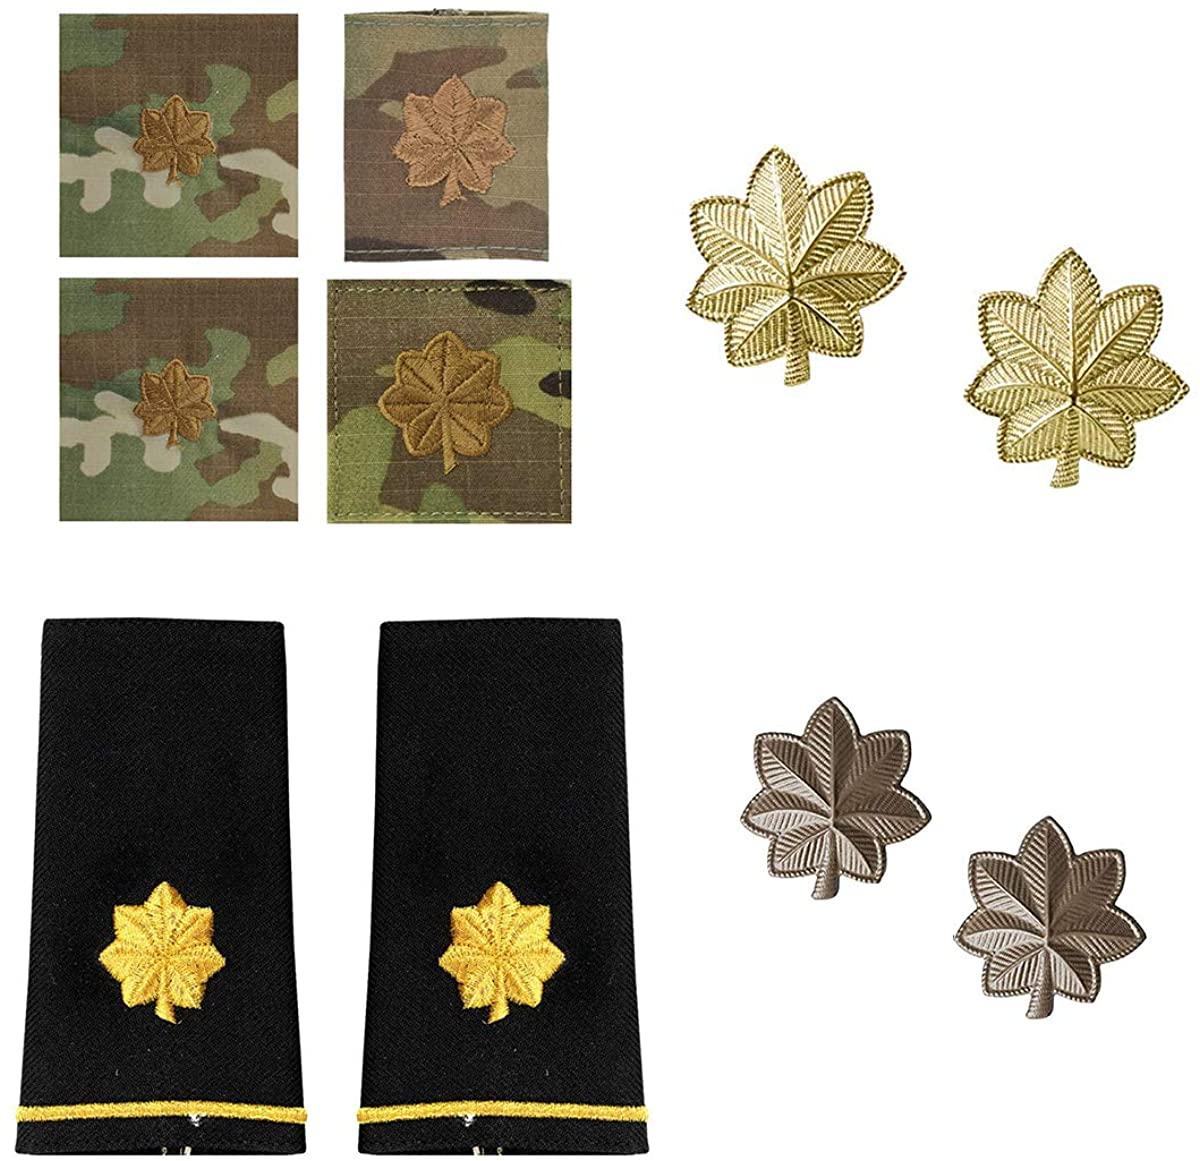 US Army Major (MAJ) Rank Bundle